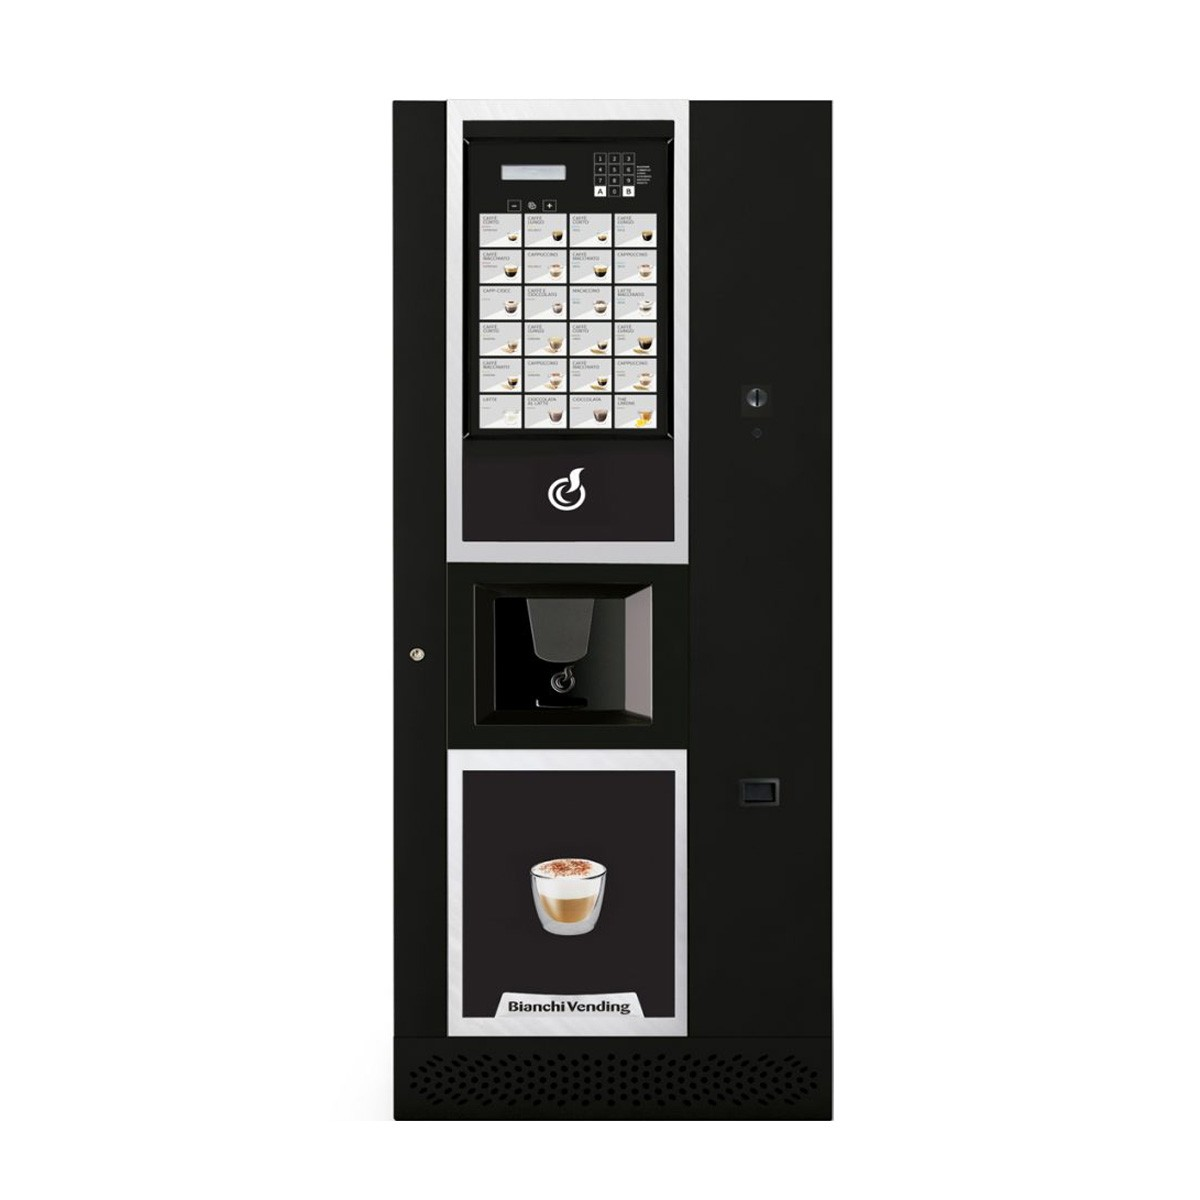 Máquina Automática Vending de Bebidas Quentes LEI 400 EASY Bianchi